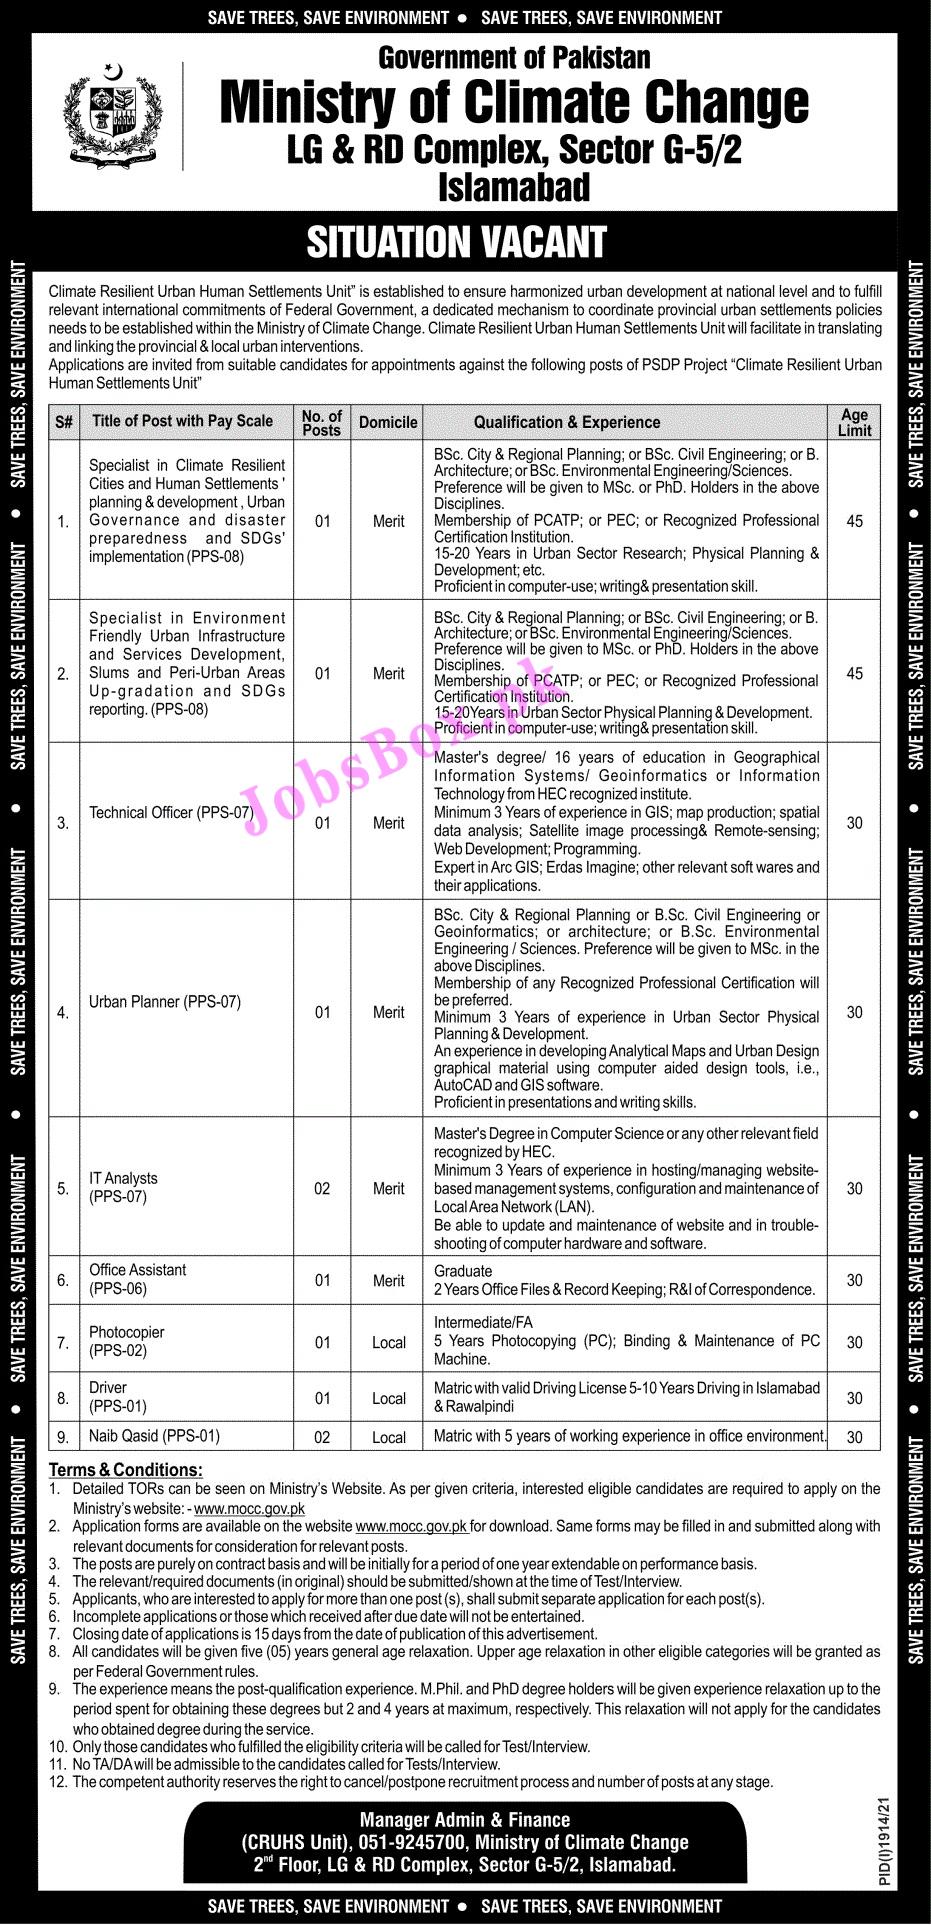 Ministry of Climate Change MOCC Jobs 2021 – www.mocc.gov.pk